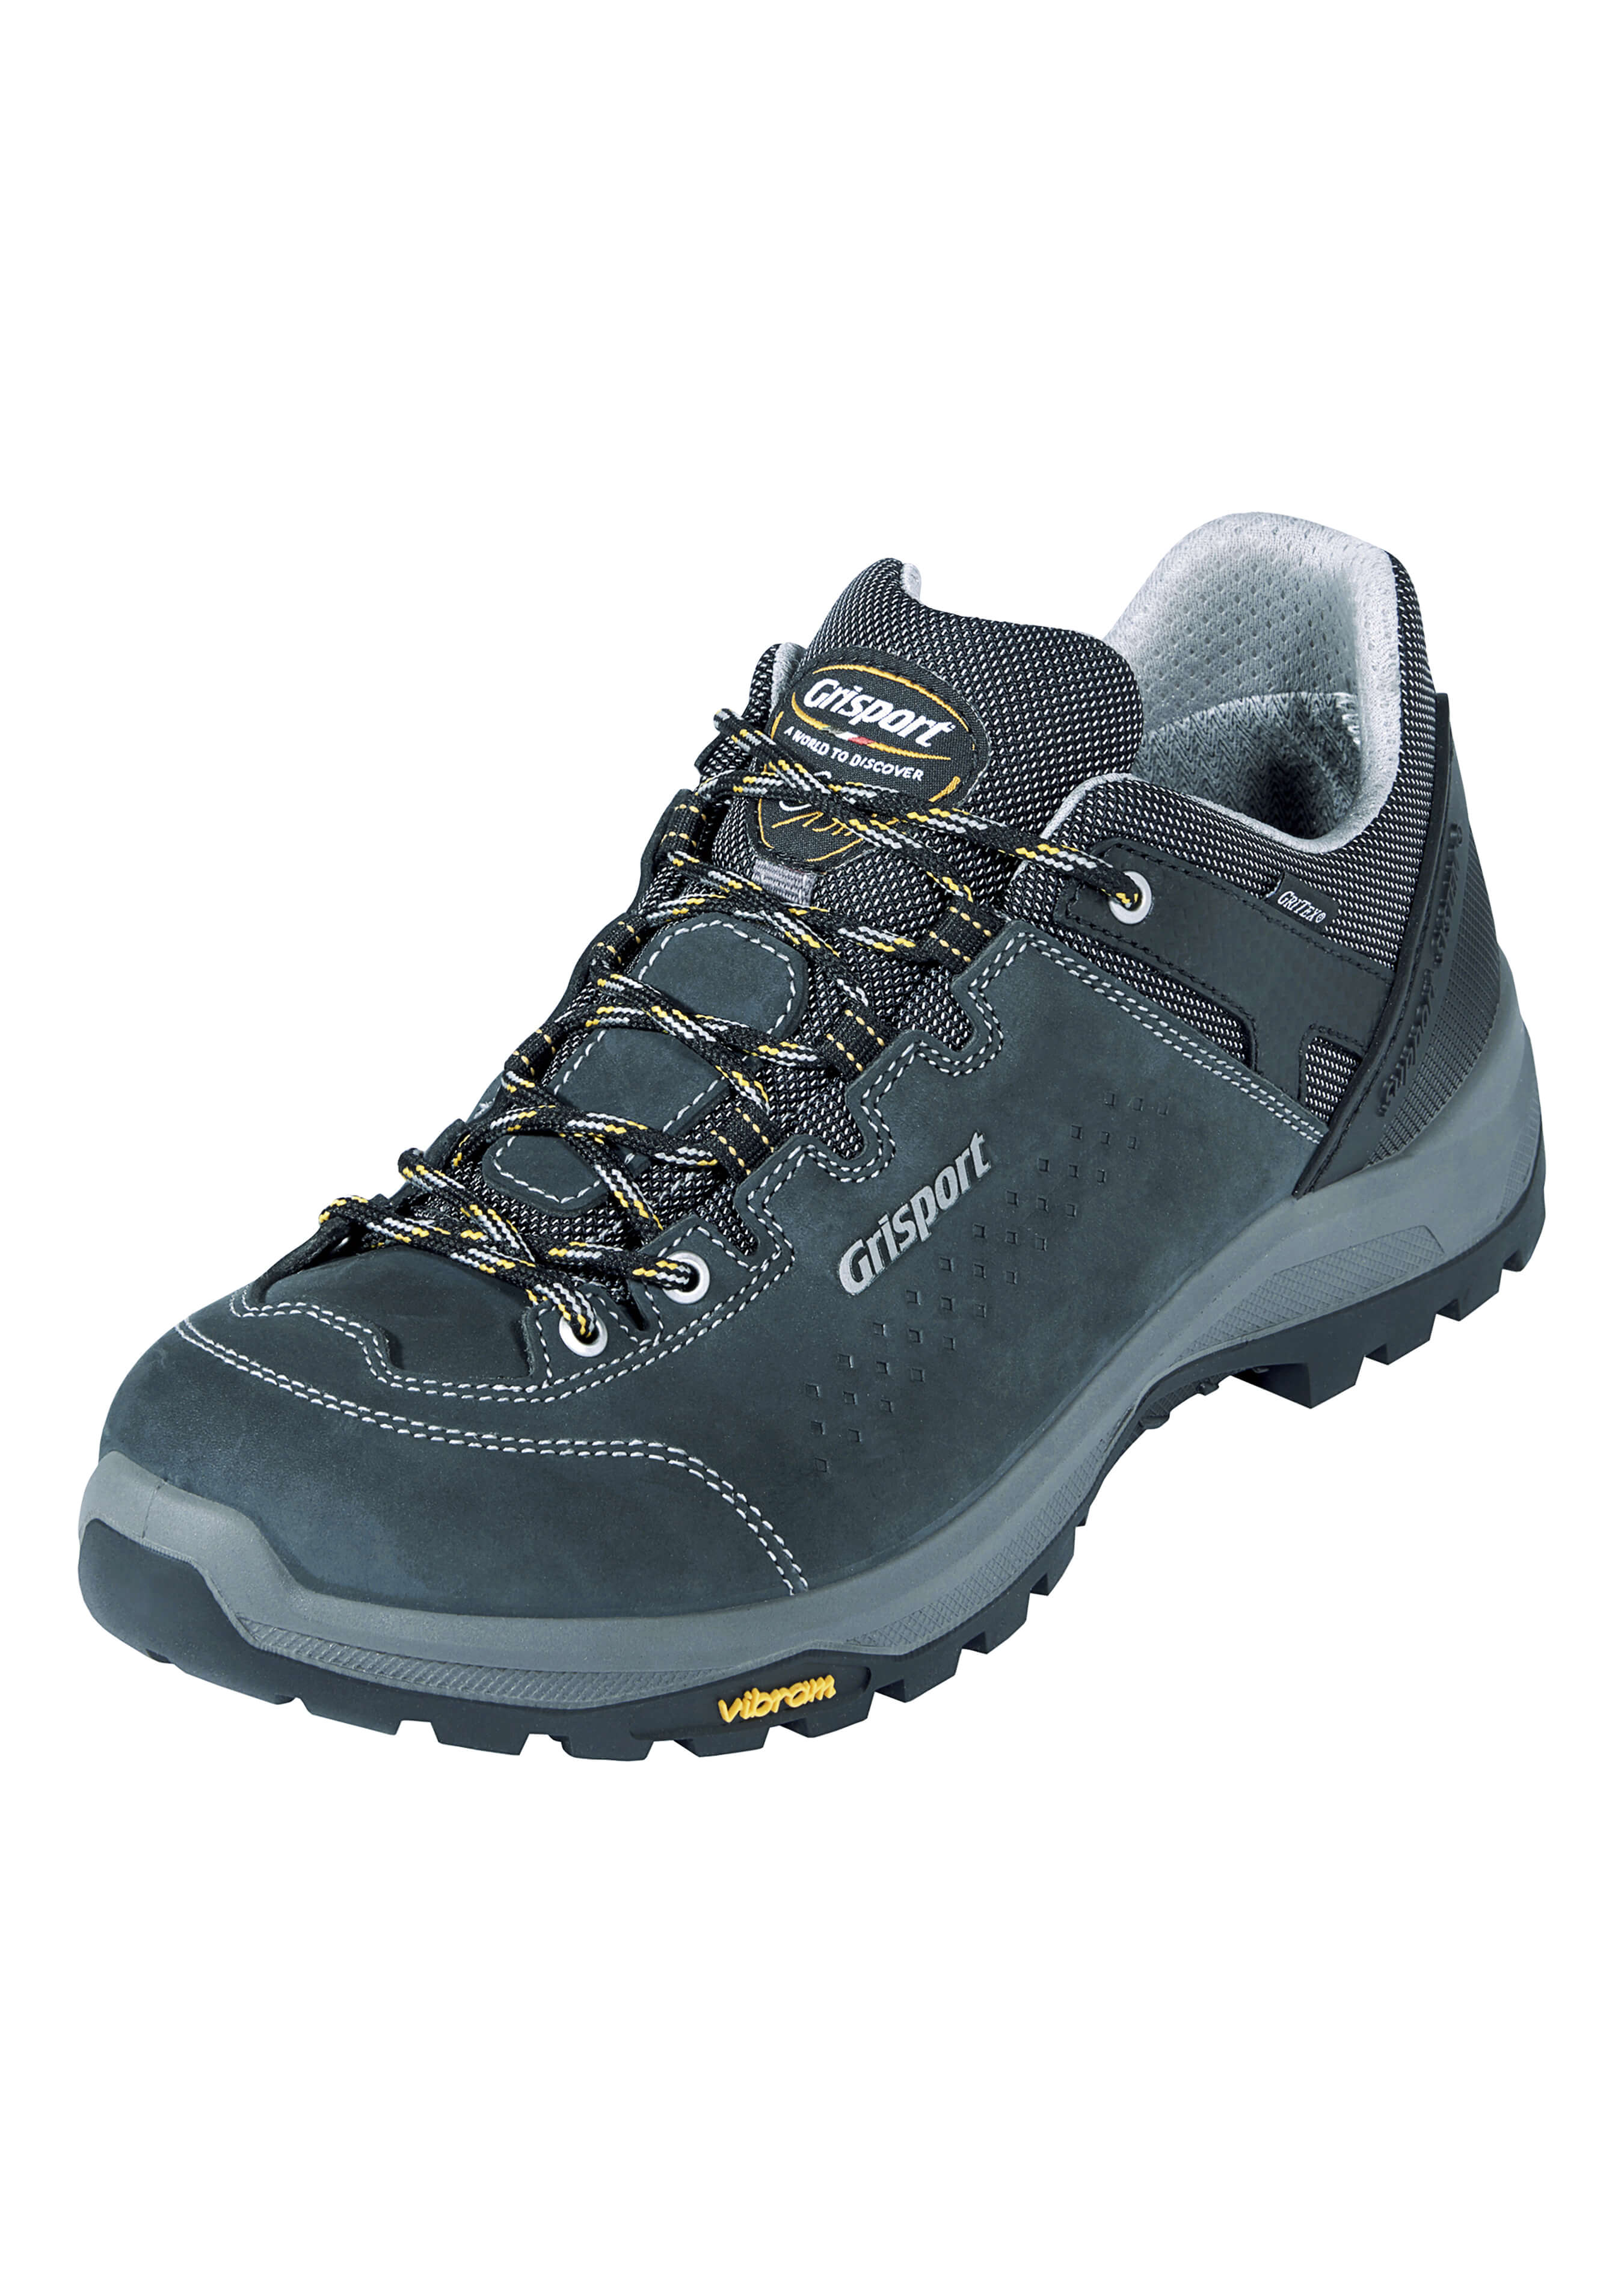 chaussure polyvalente de trekking Oceano 42201136 1